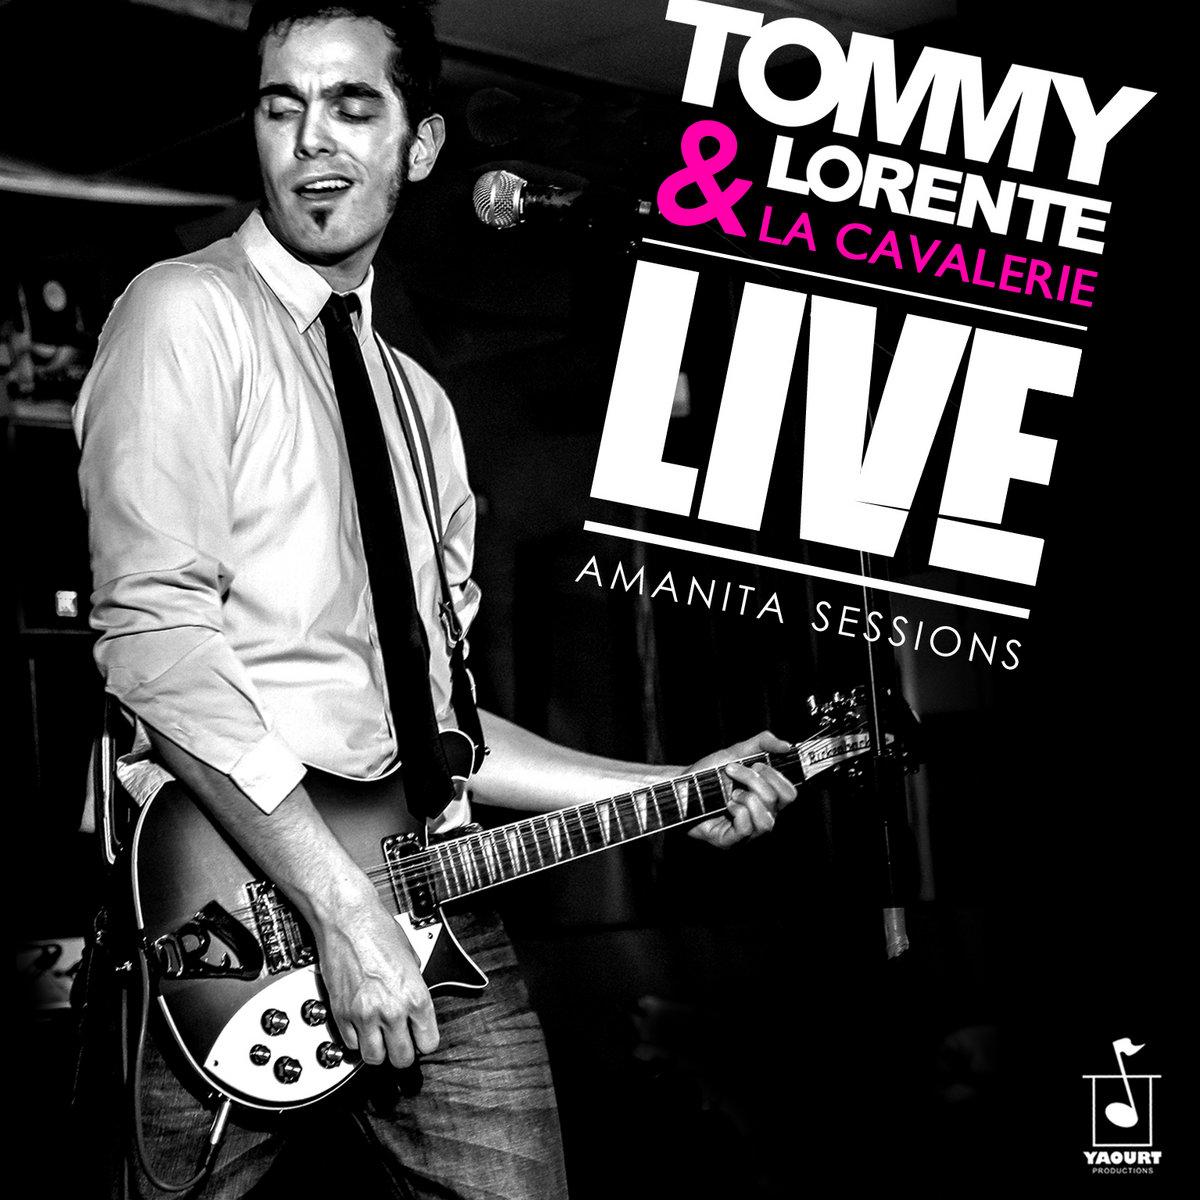 Tommy Lorente